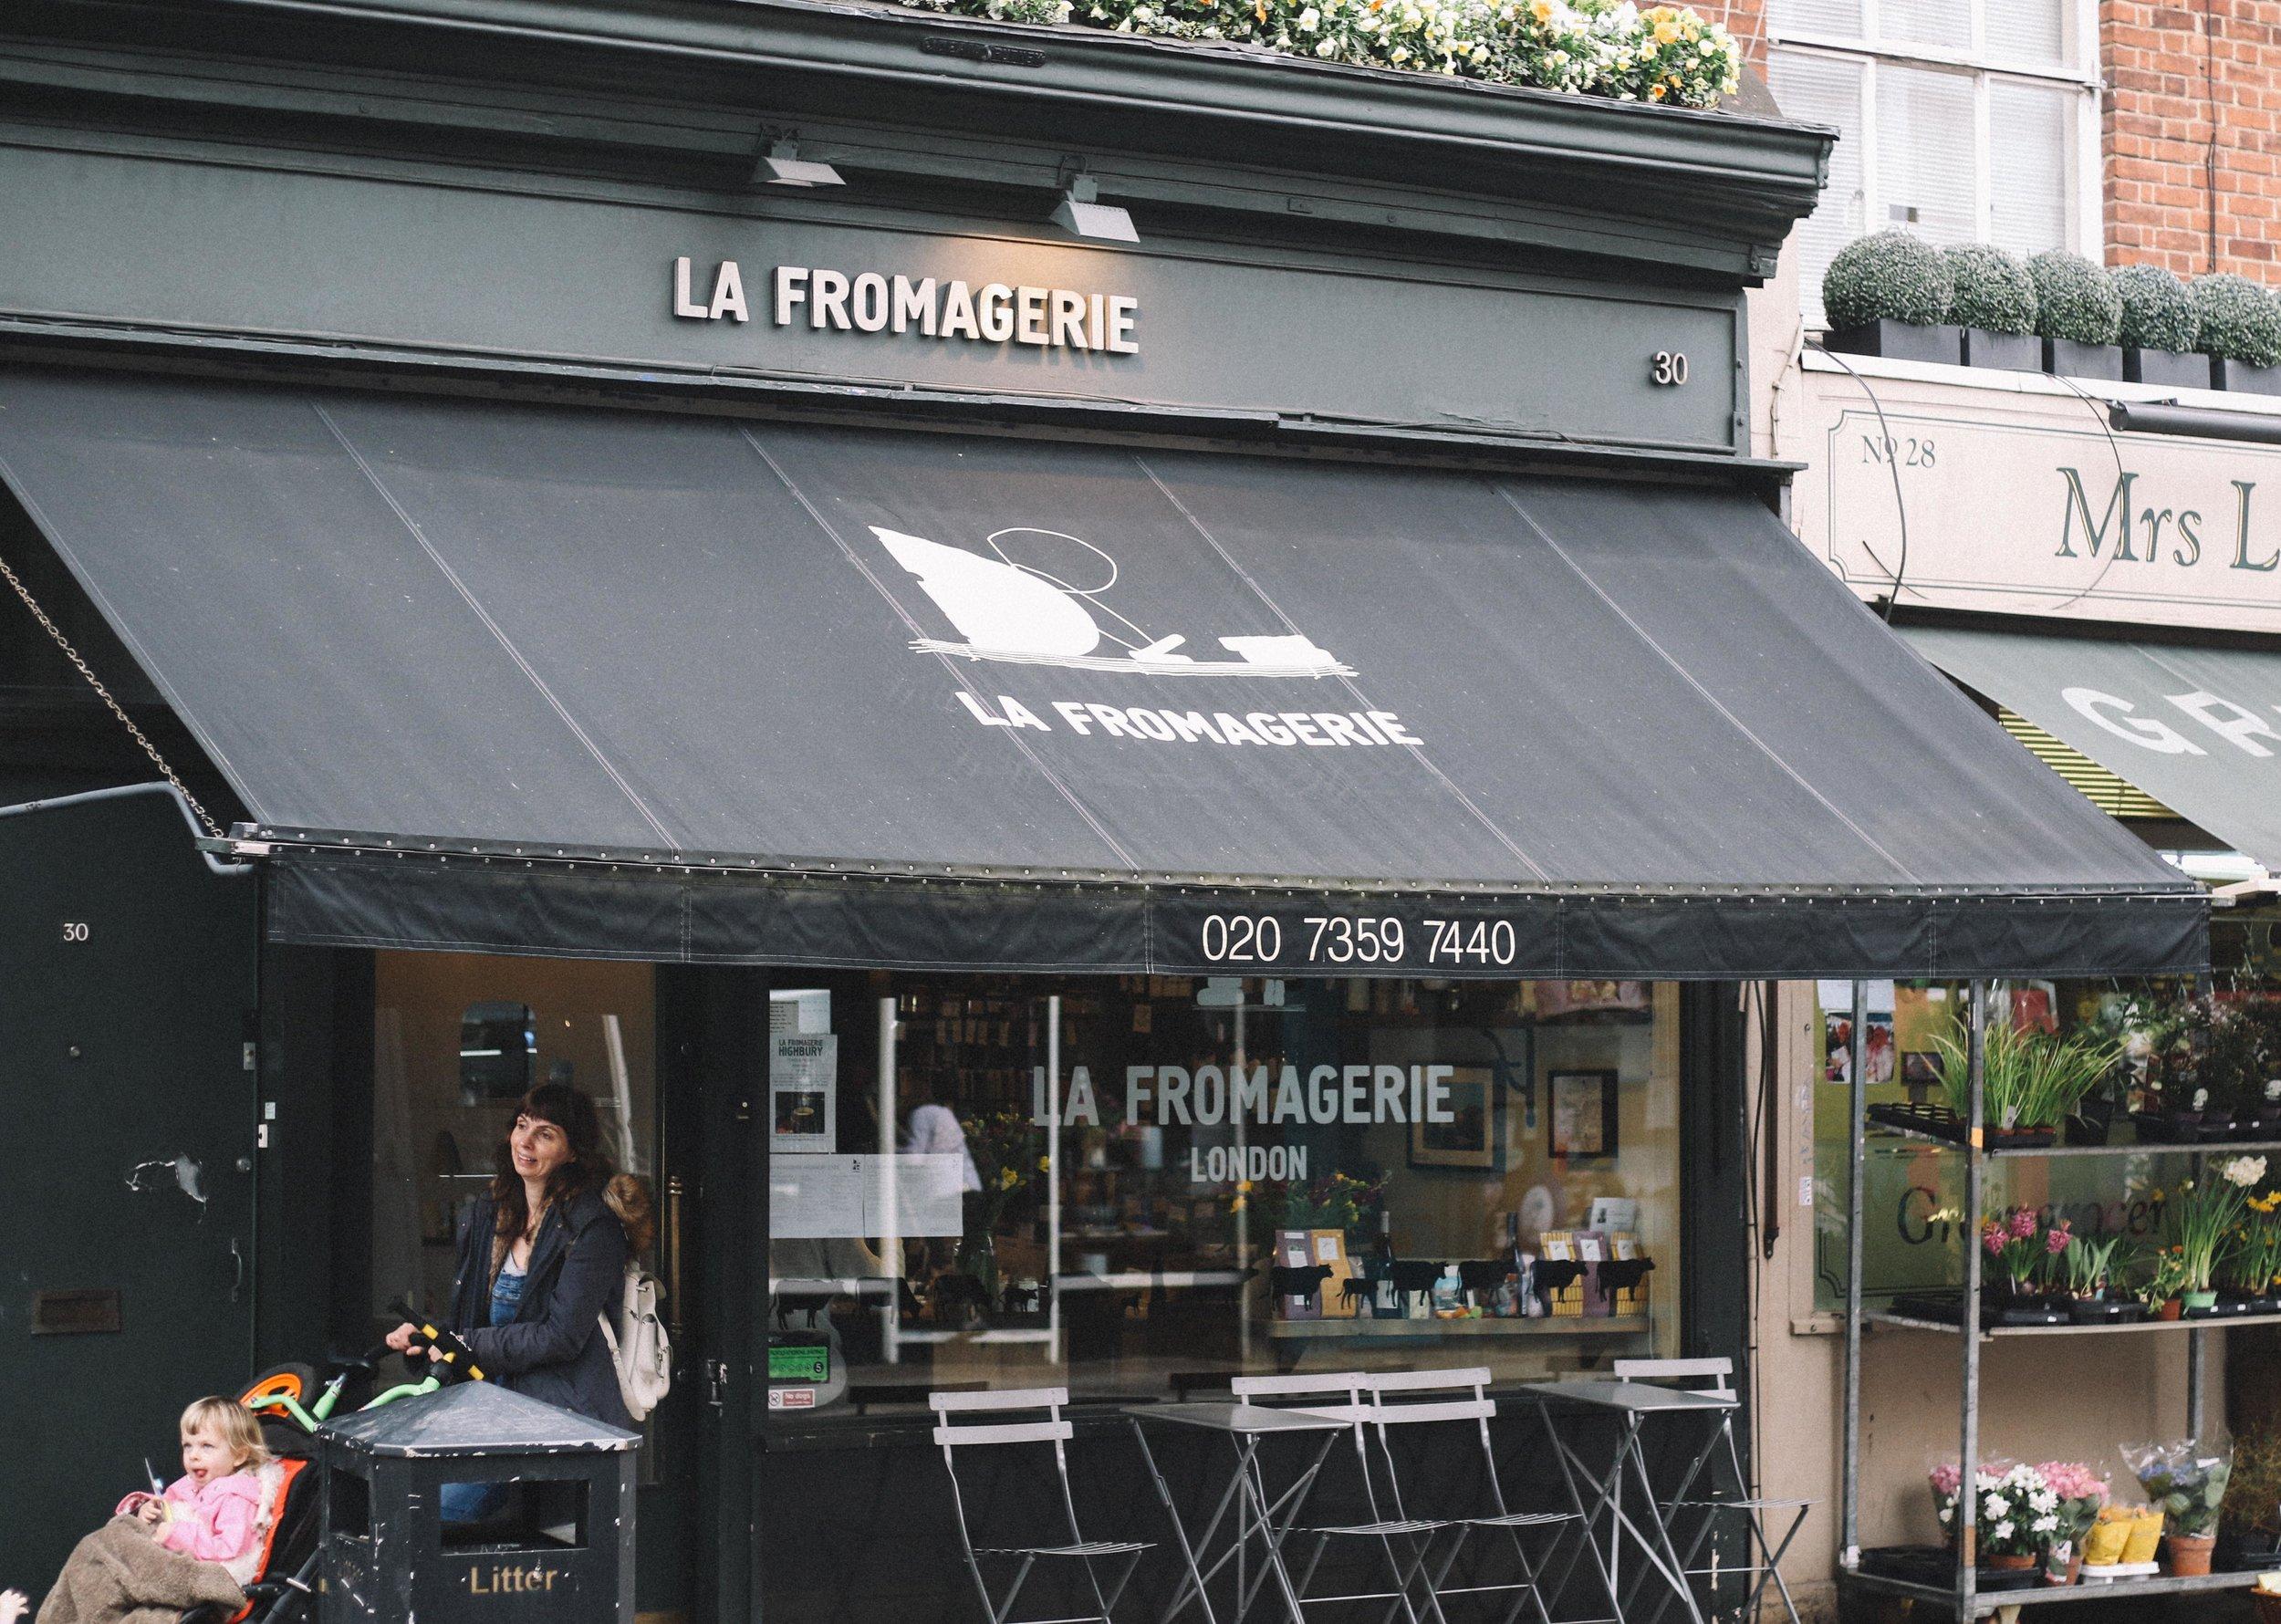 la fromagerie-13.jpg